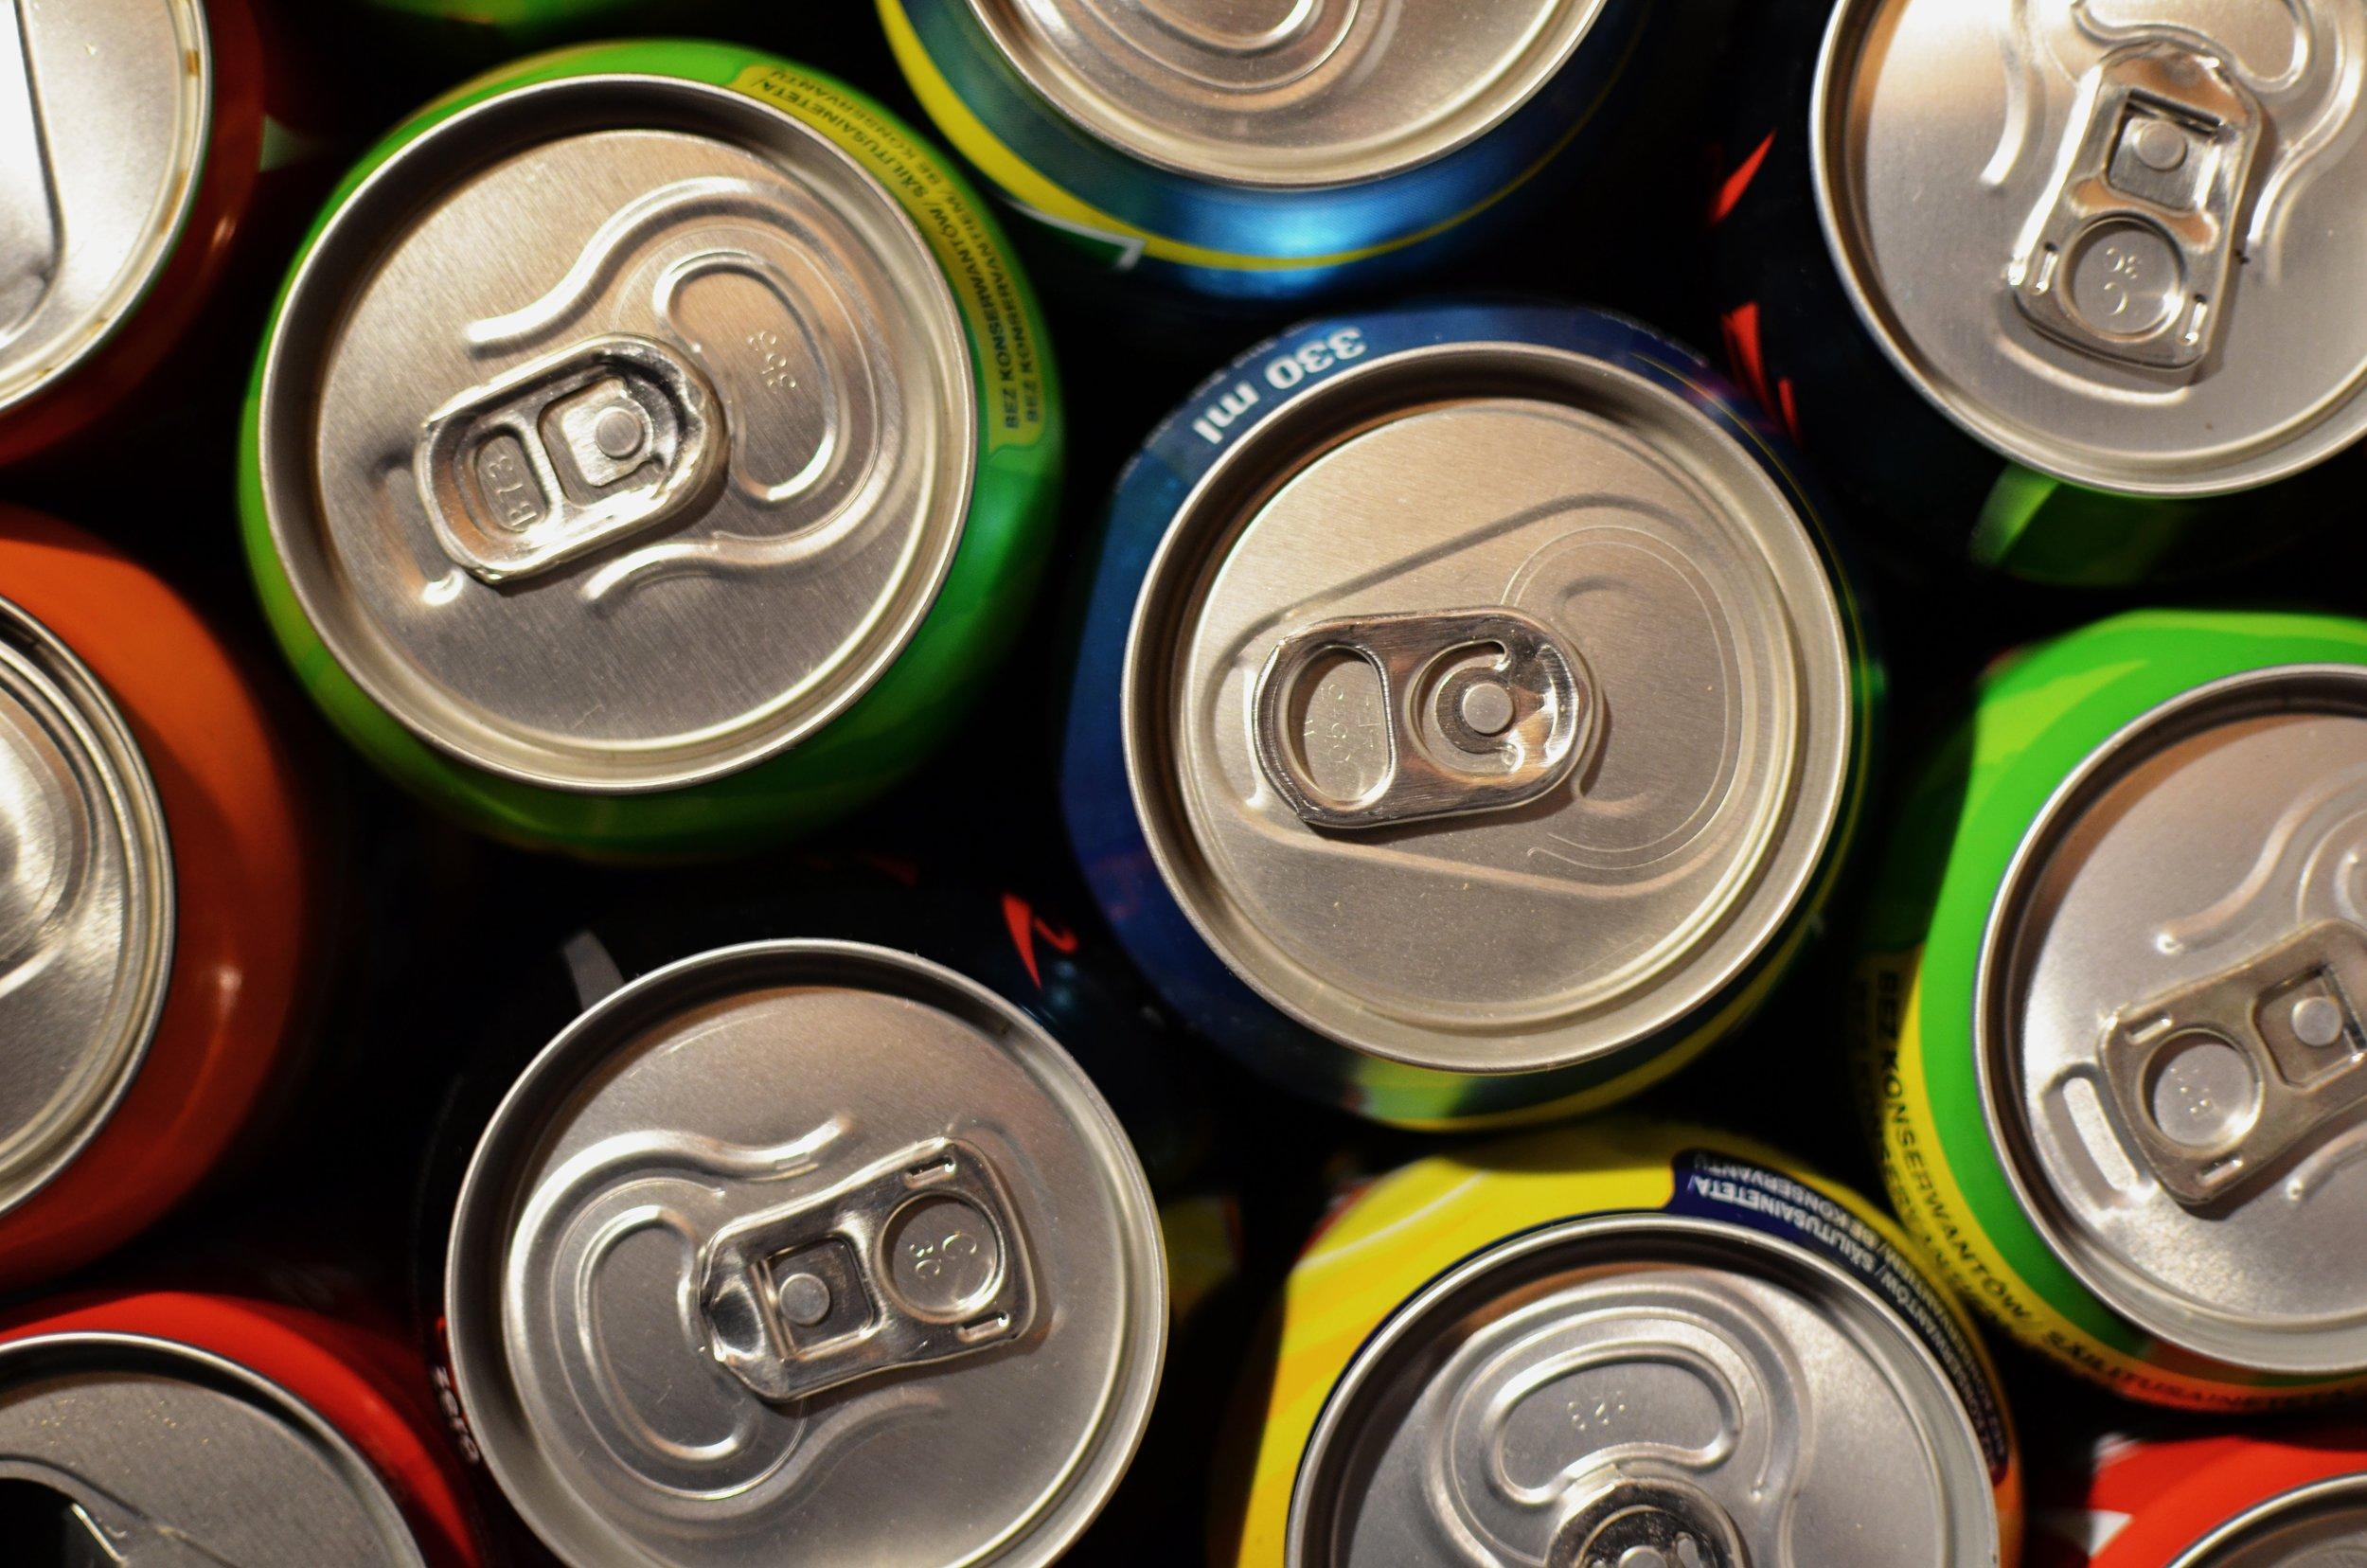 beverage-drinks-soda-3008.jpg